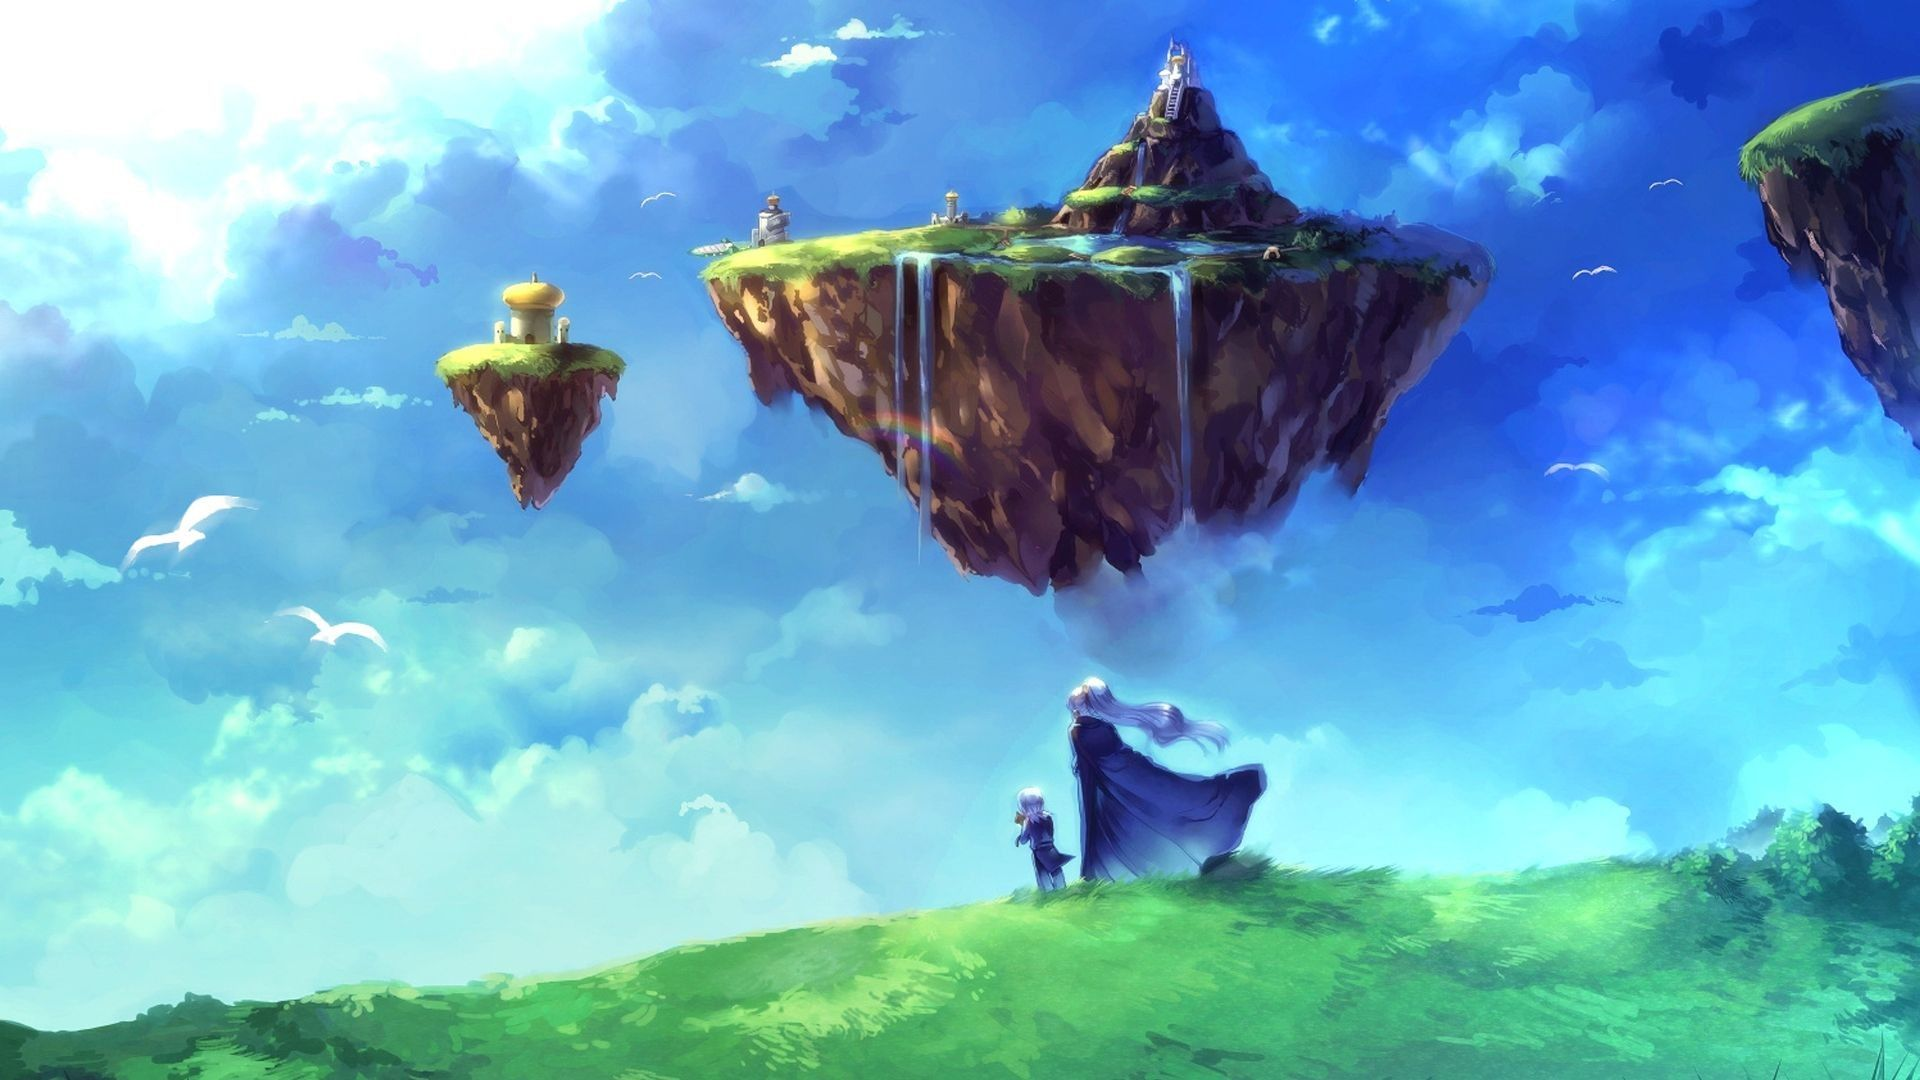 Wallpaper Video Gaming 2021 Live Wallpaper Hd Chrono Trigger Anime Wallpaper Fantasy Island